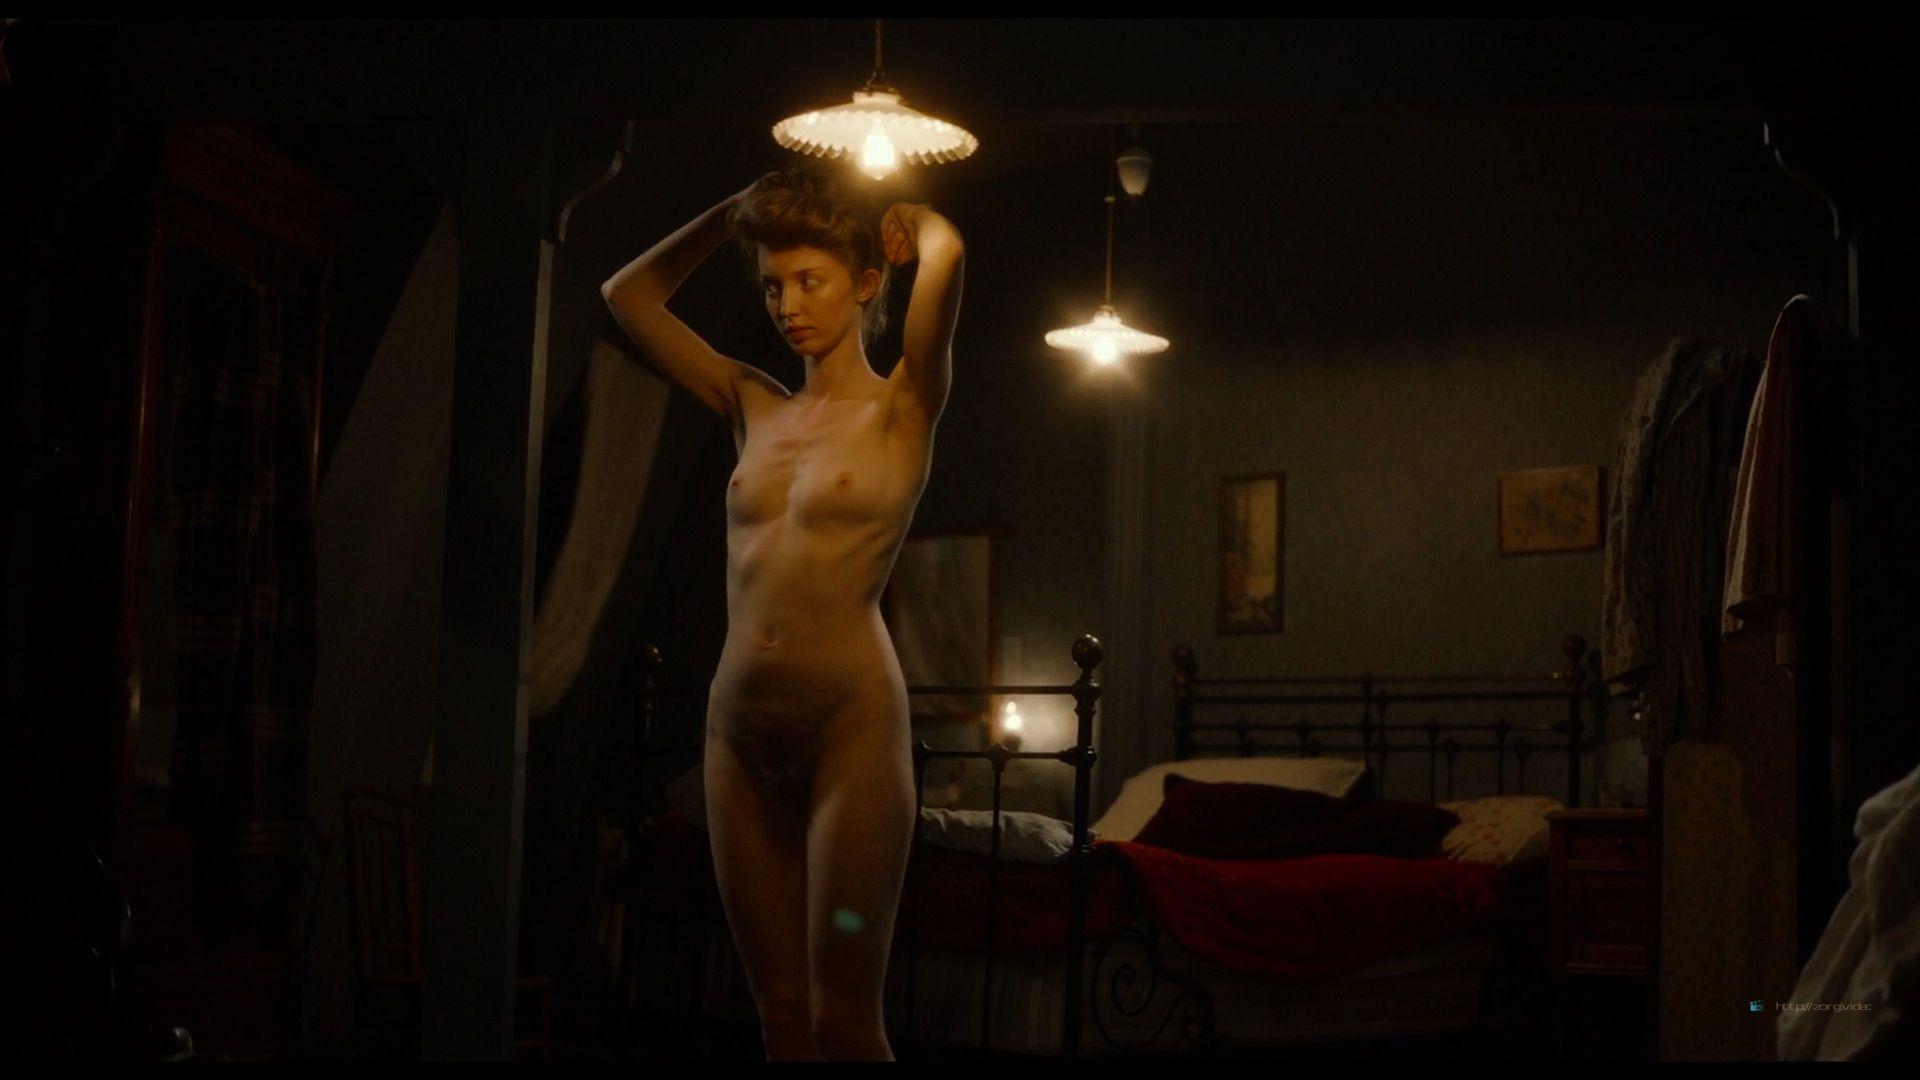 0608000137710_12_Noemie-Merlant-nude-full-frontal-Camelia-Jordana-Amira-Casar-and-others-nude-Curiosa-2019-HD-1080p-Web-.jpg